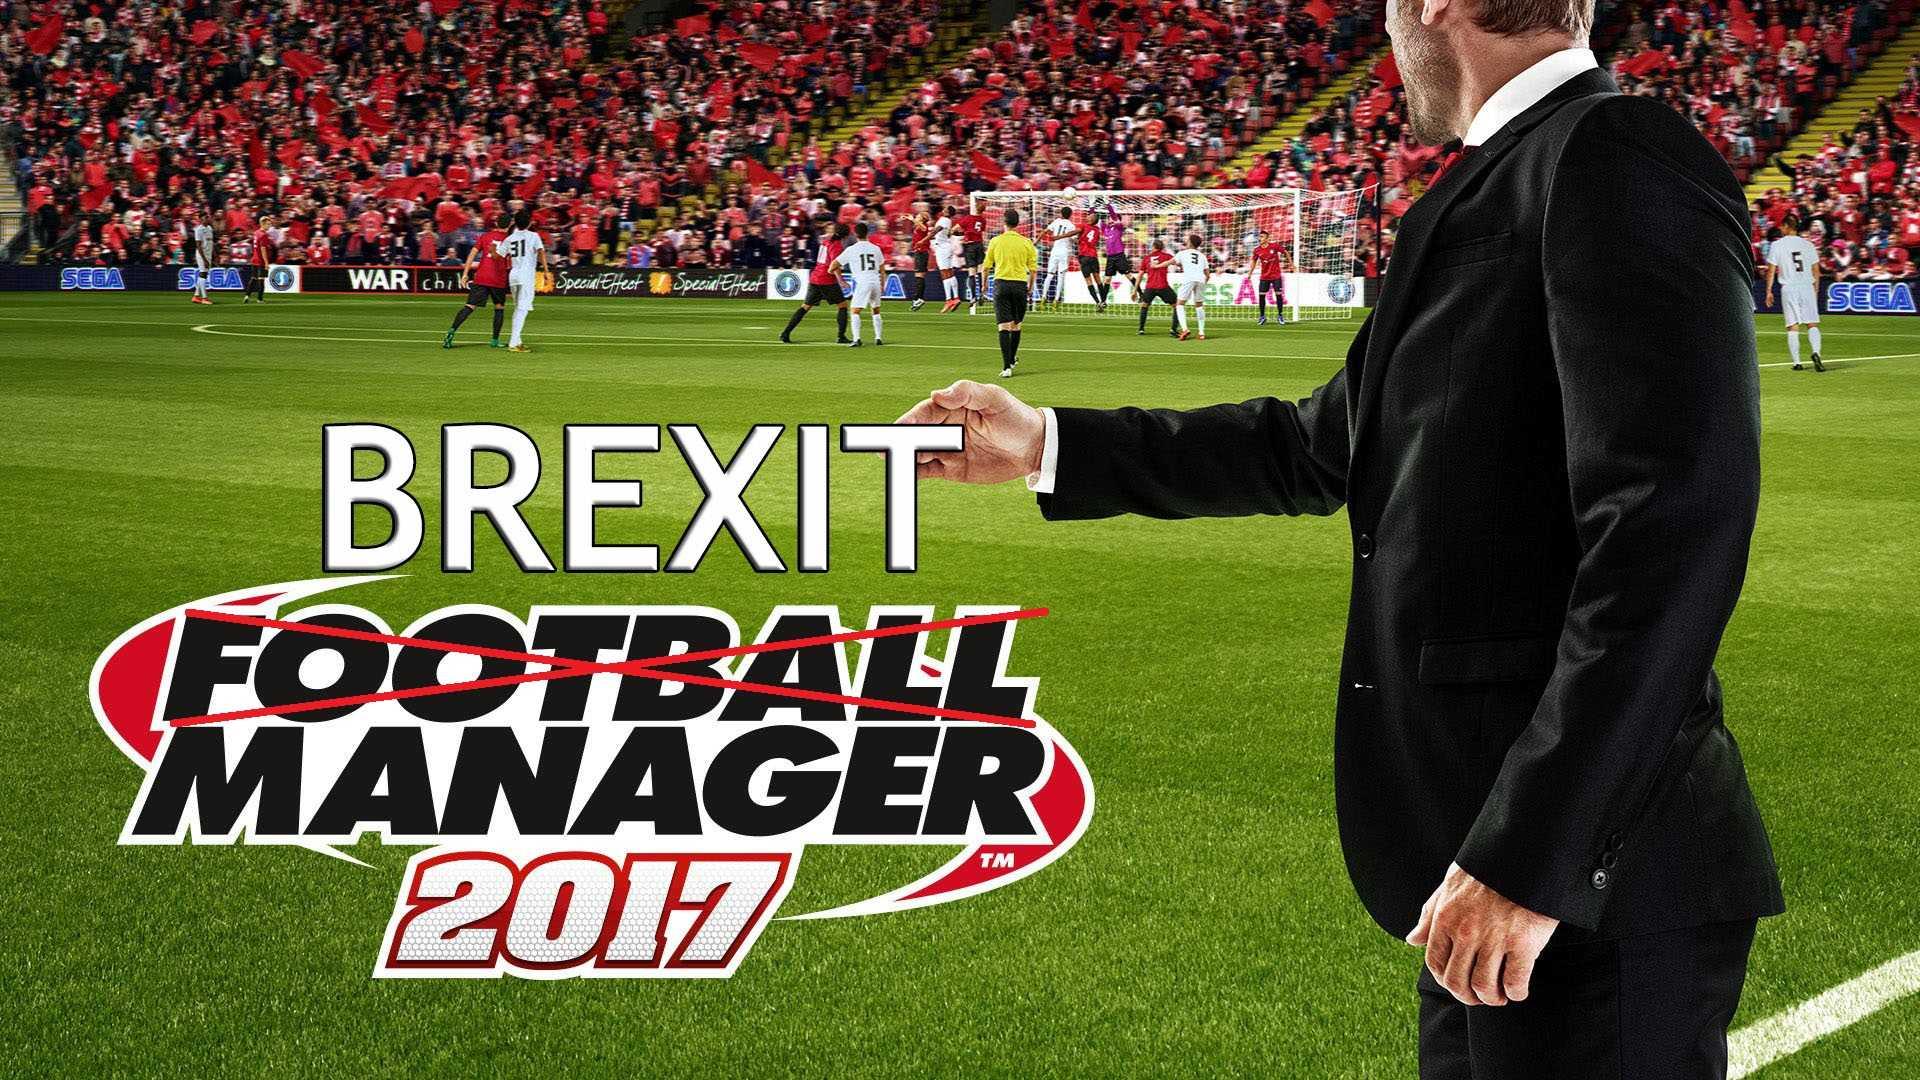 В Football Manager 2017 будет симуляция Брекзита